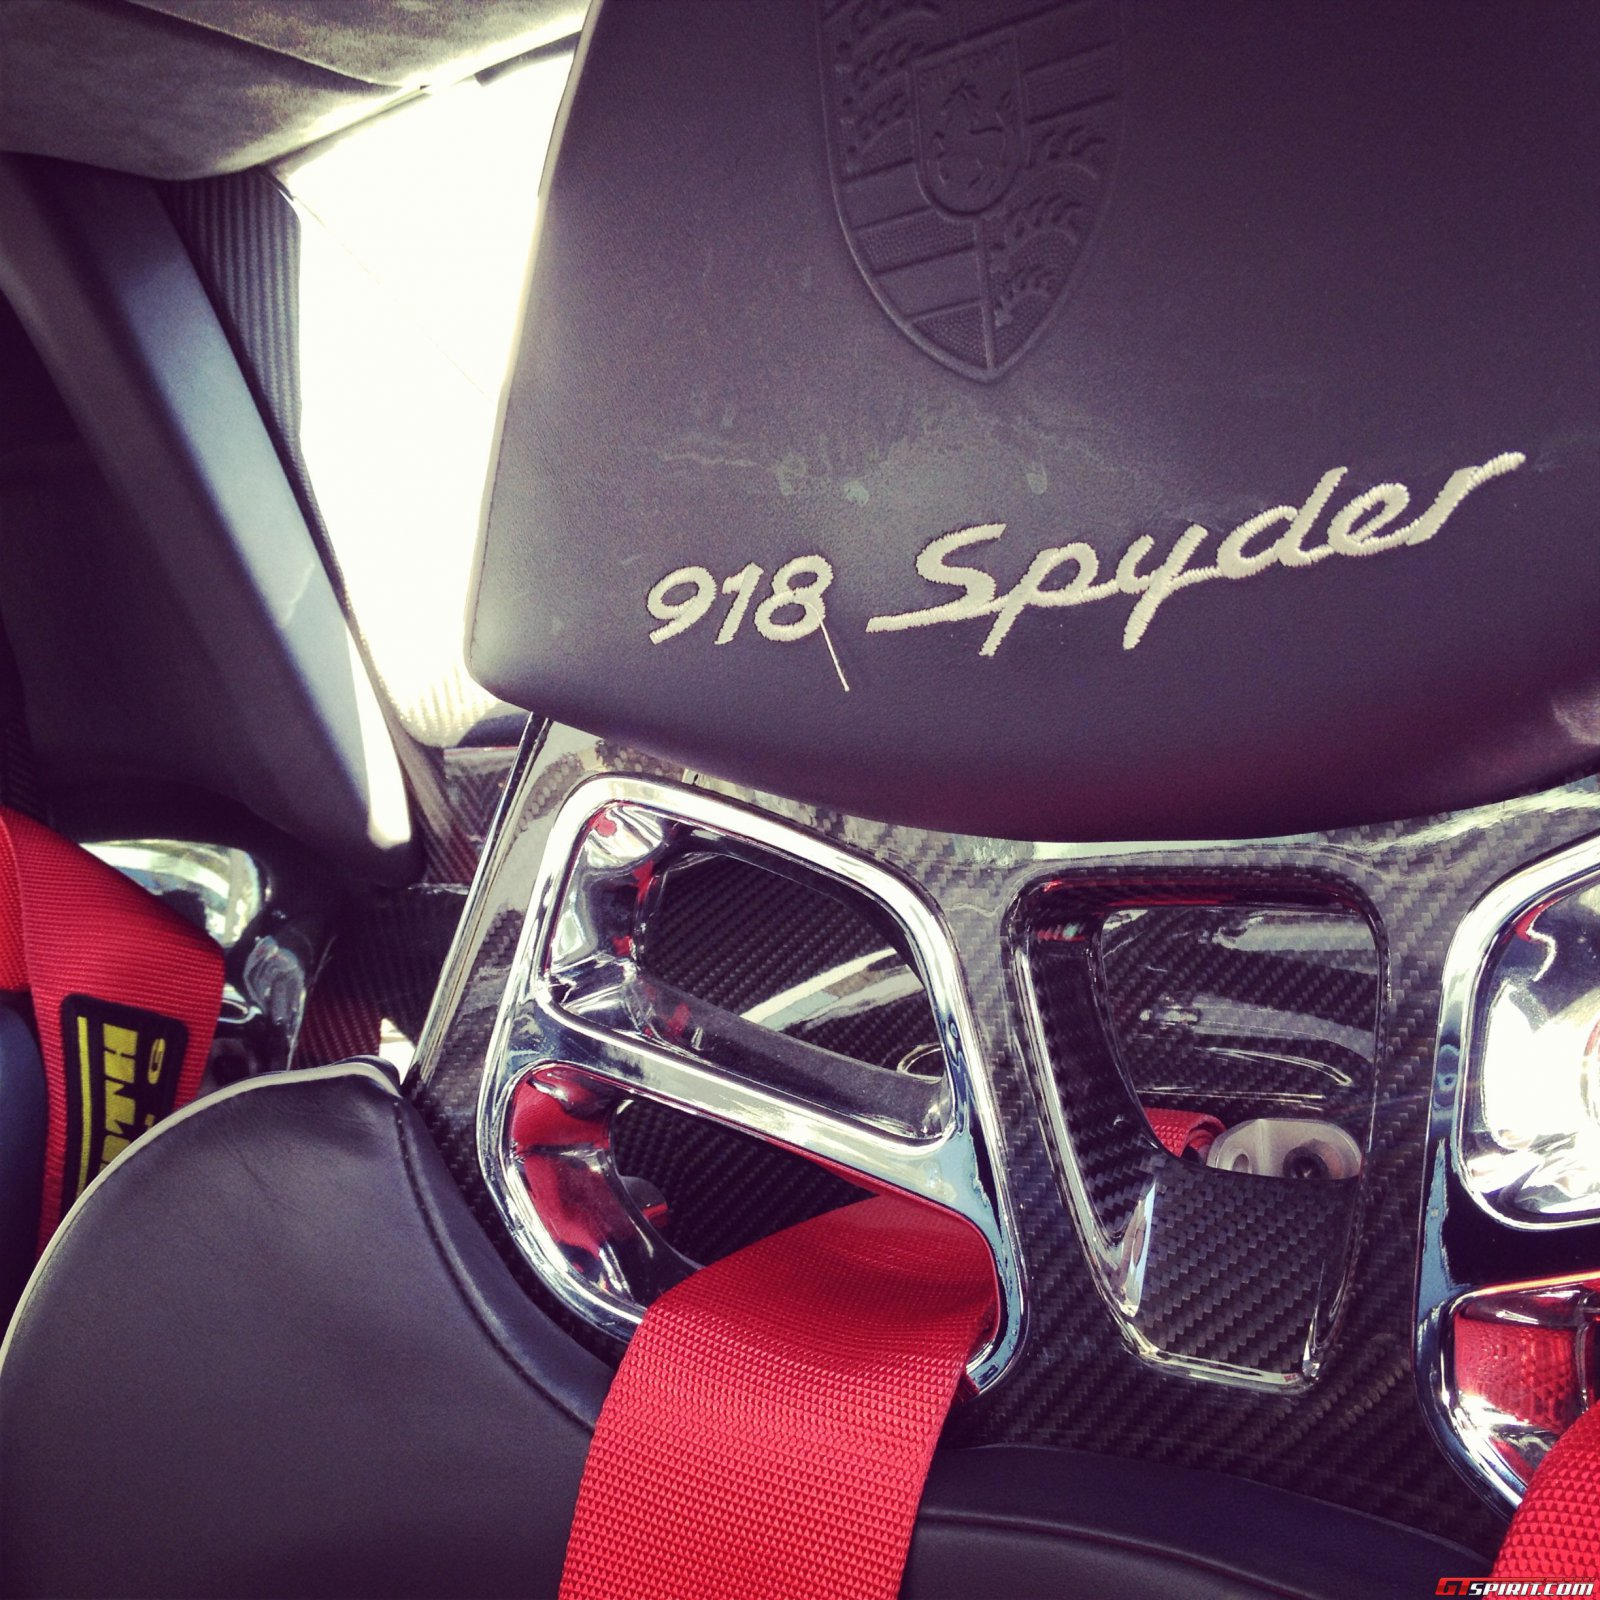 fotojpg-1377474092 Interesting Hinh Anh Xe Porsche 918 Spyder Cars Trend